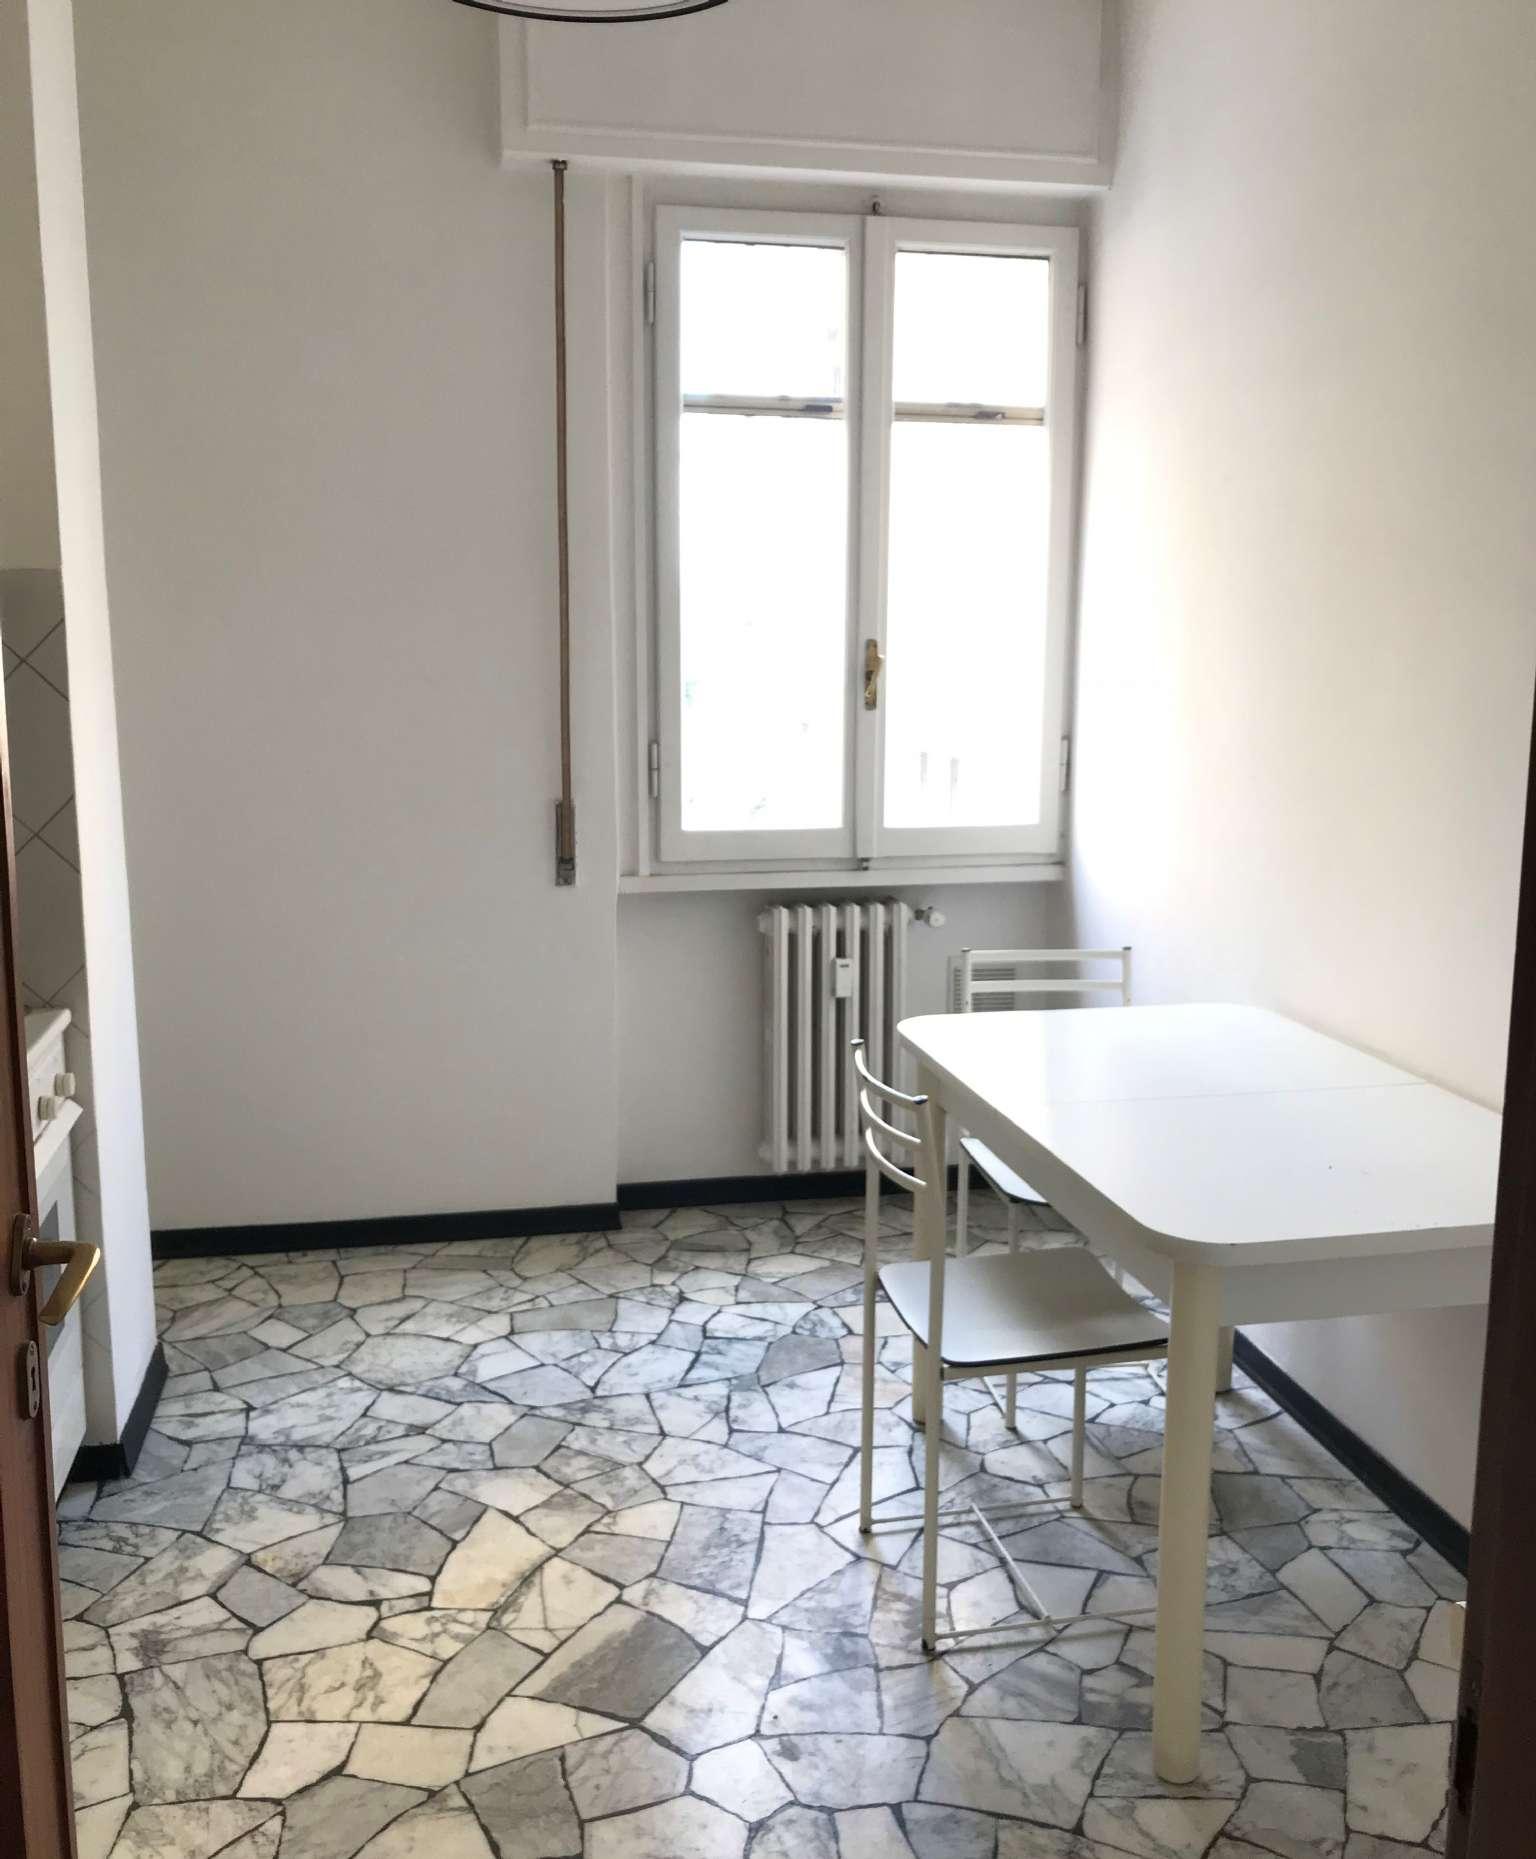 Appartamento in Vendita a Firenze Periferia Nord: 2 locali, 60 mq